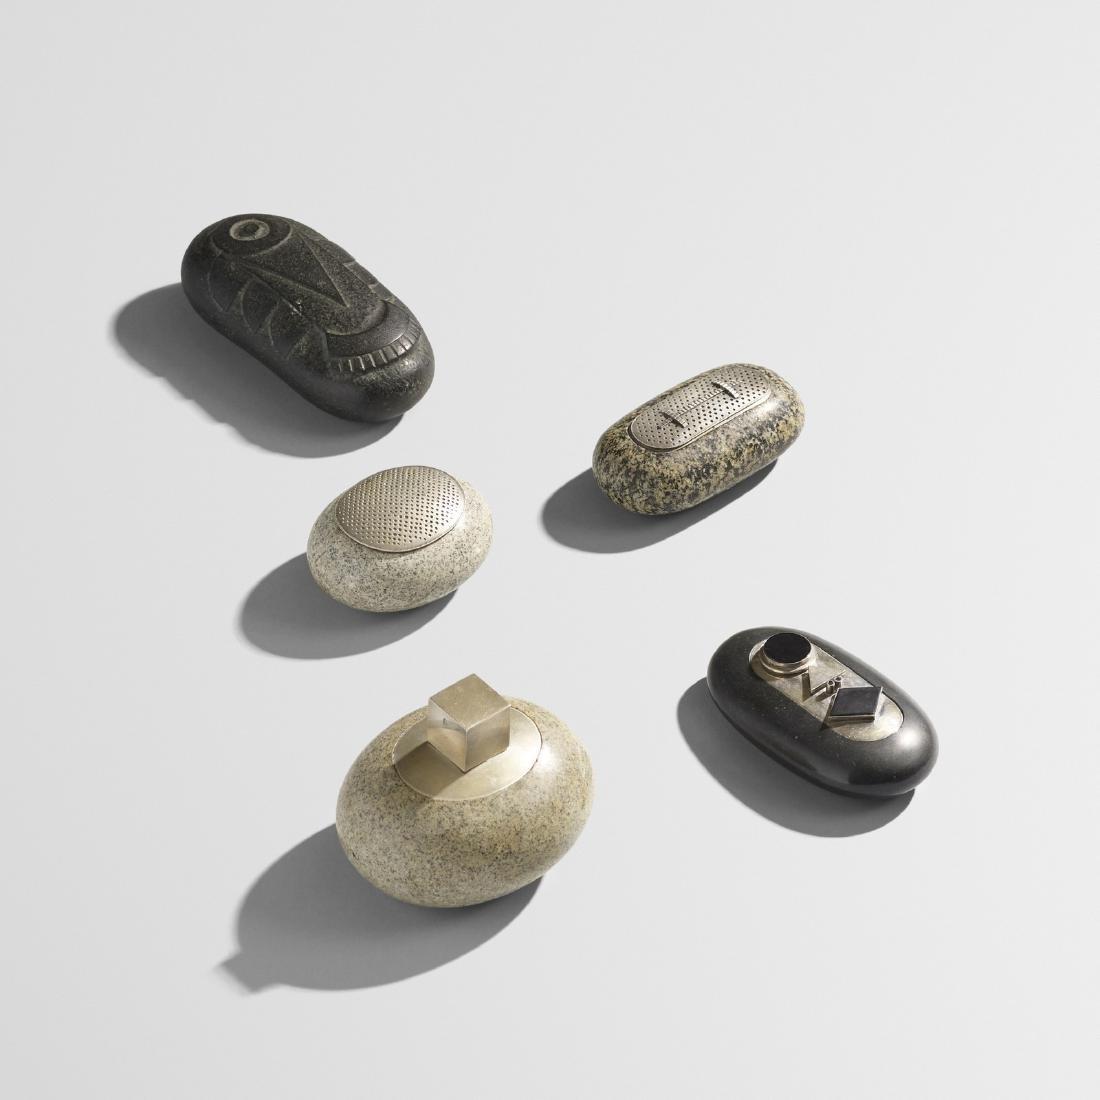 John Prip, Fish Stone - 2